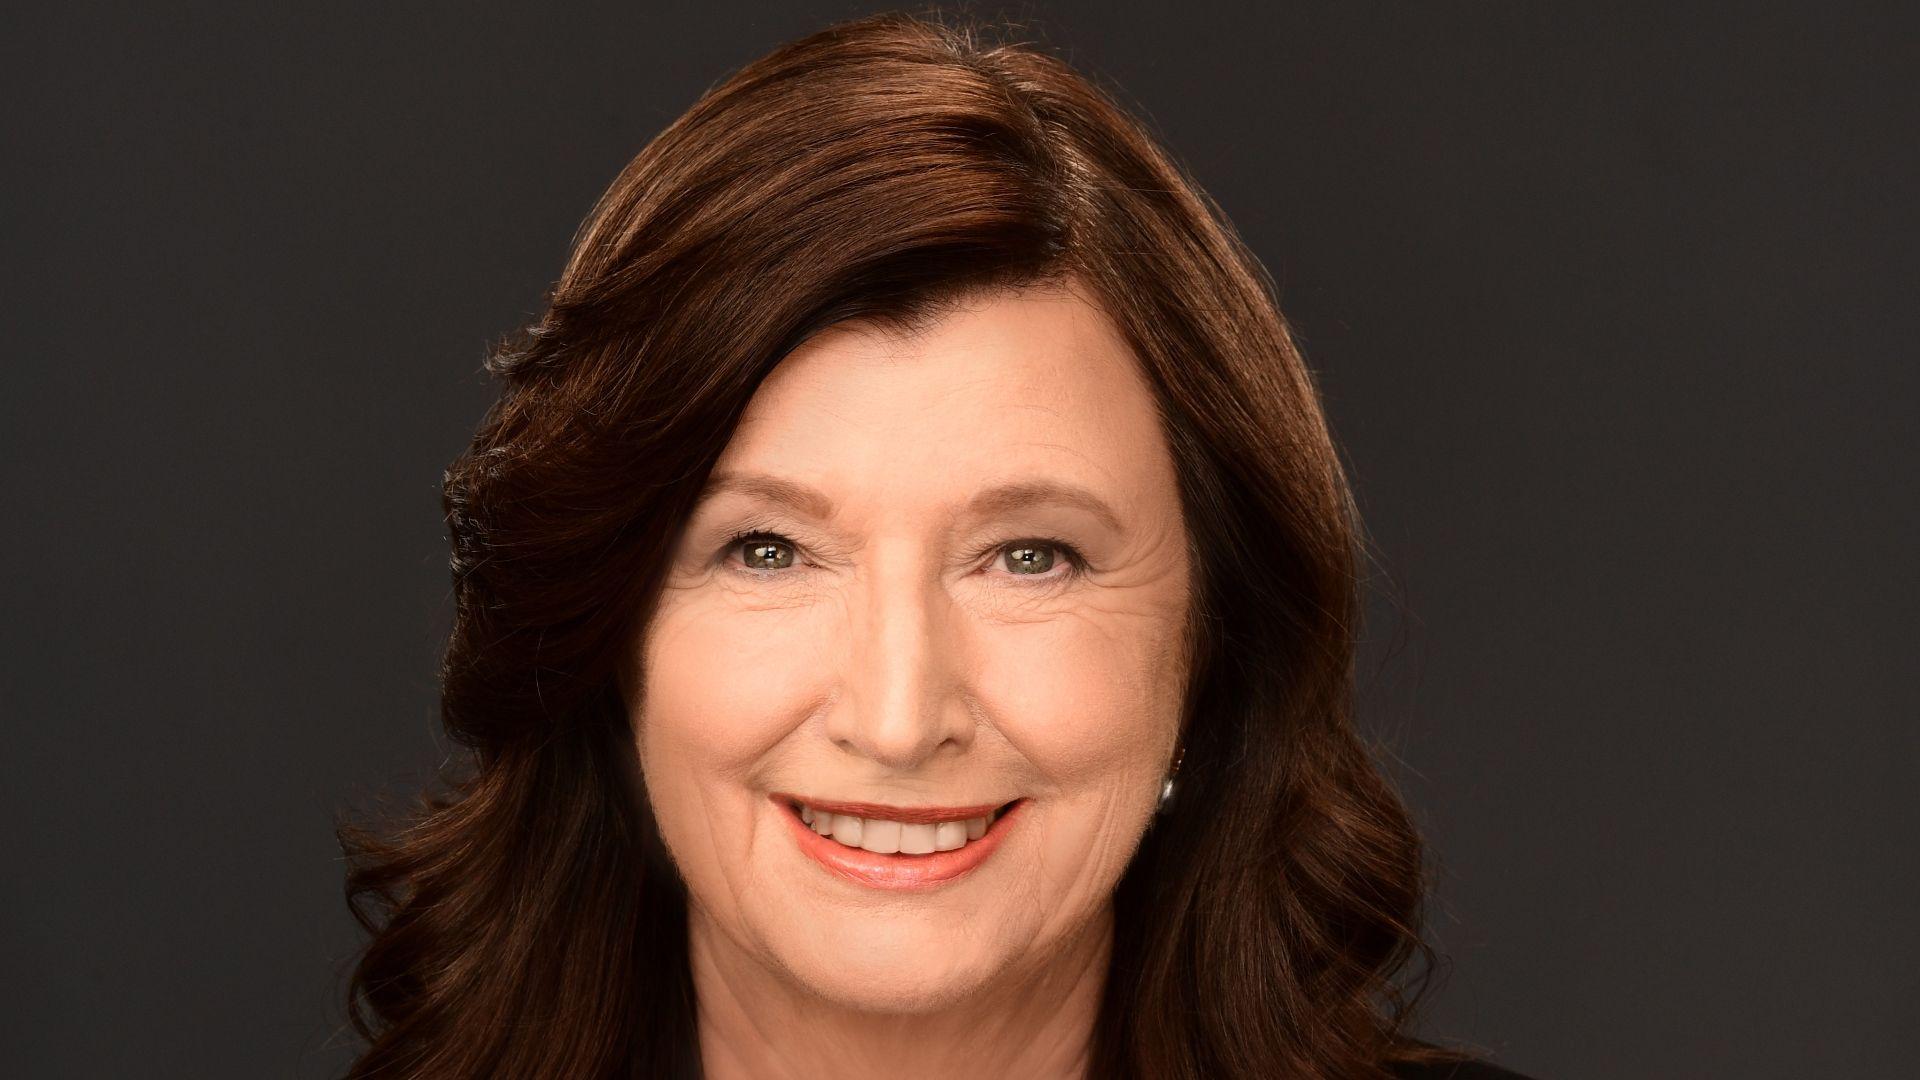 Dr Lesley Forster appointed inaugural Dean of Rural Medicine